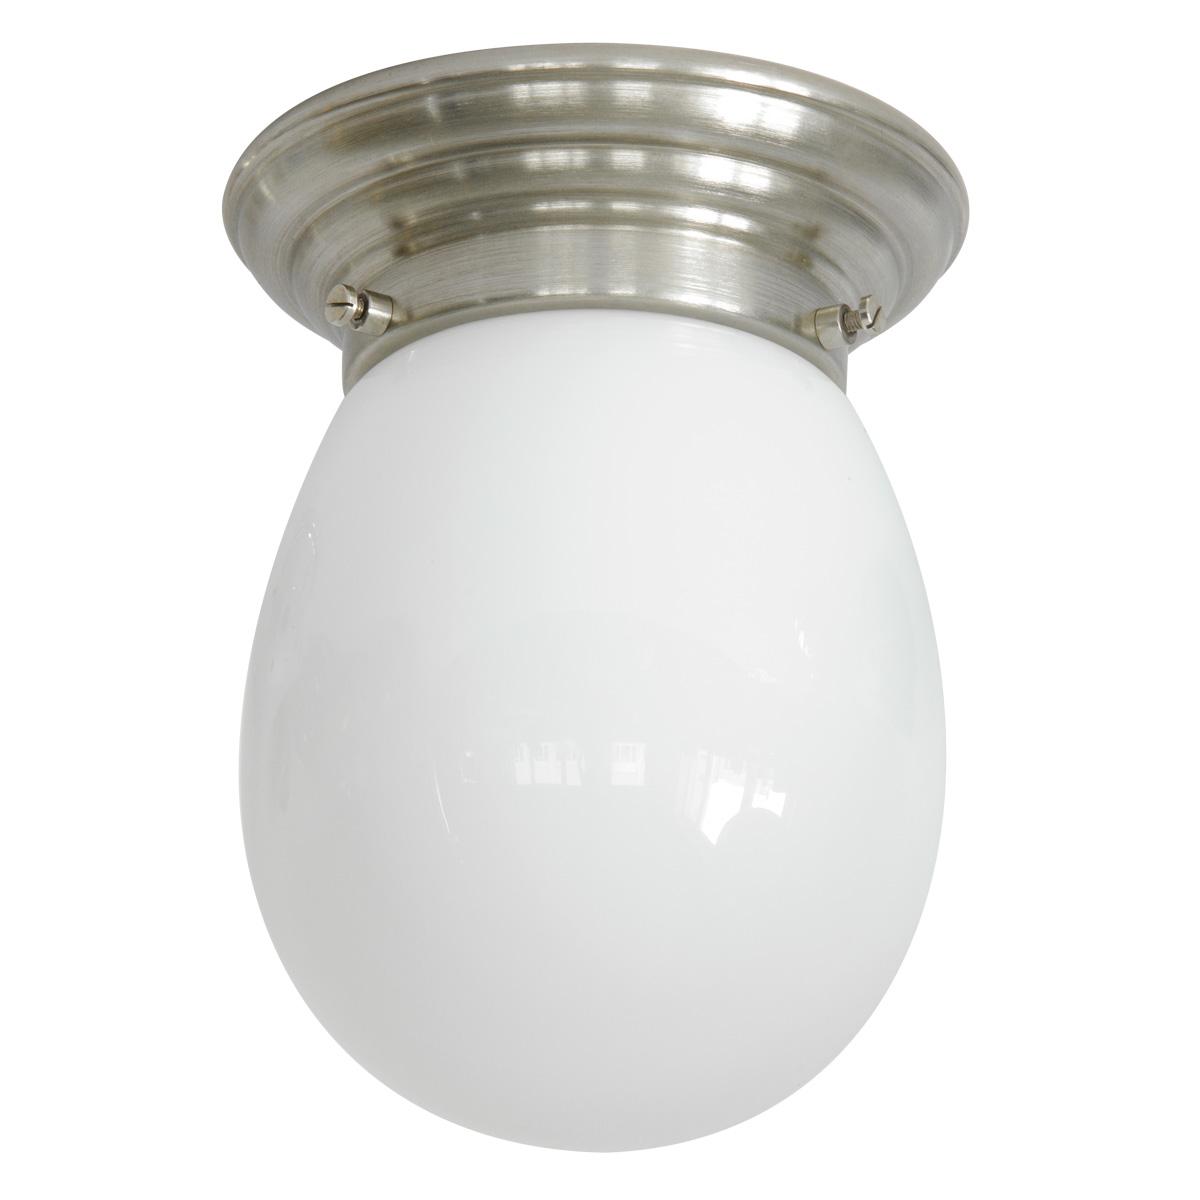 Opalglas Ø 14 Lumi Casa Cm Kleine Deckenlampe Mit Tropfen qSjMVpGzLU